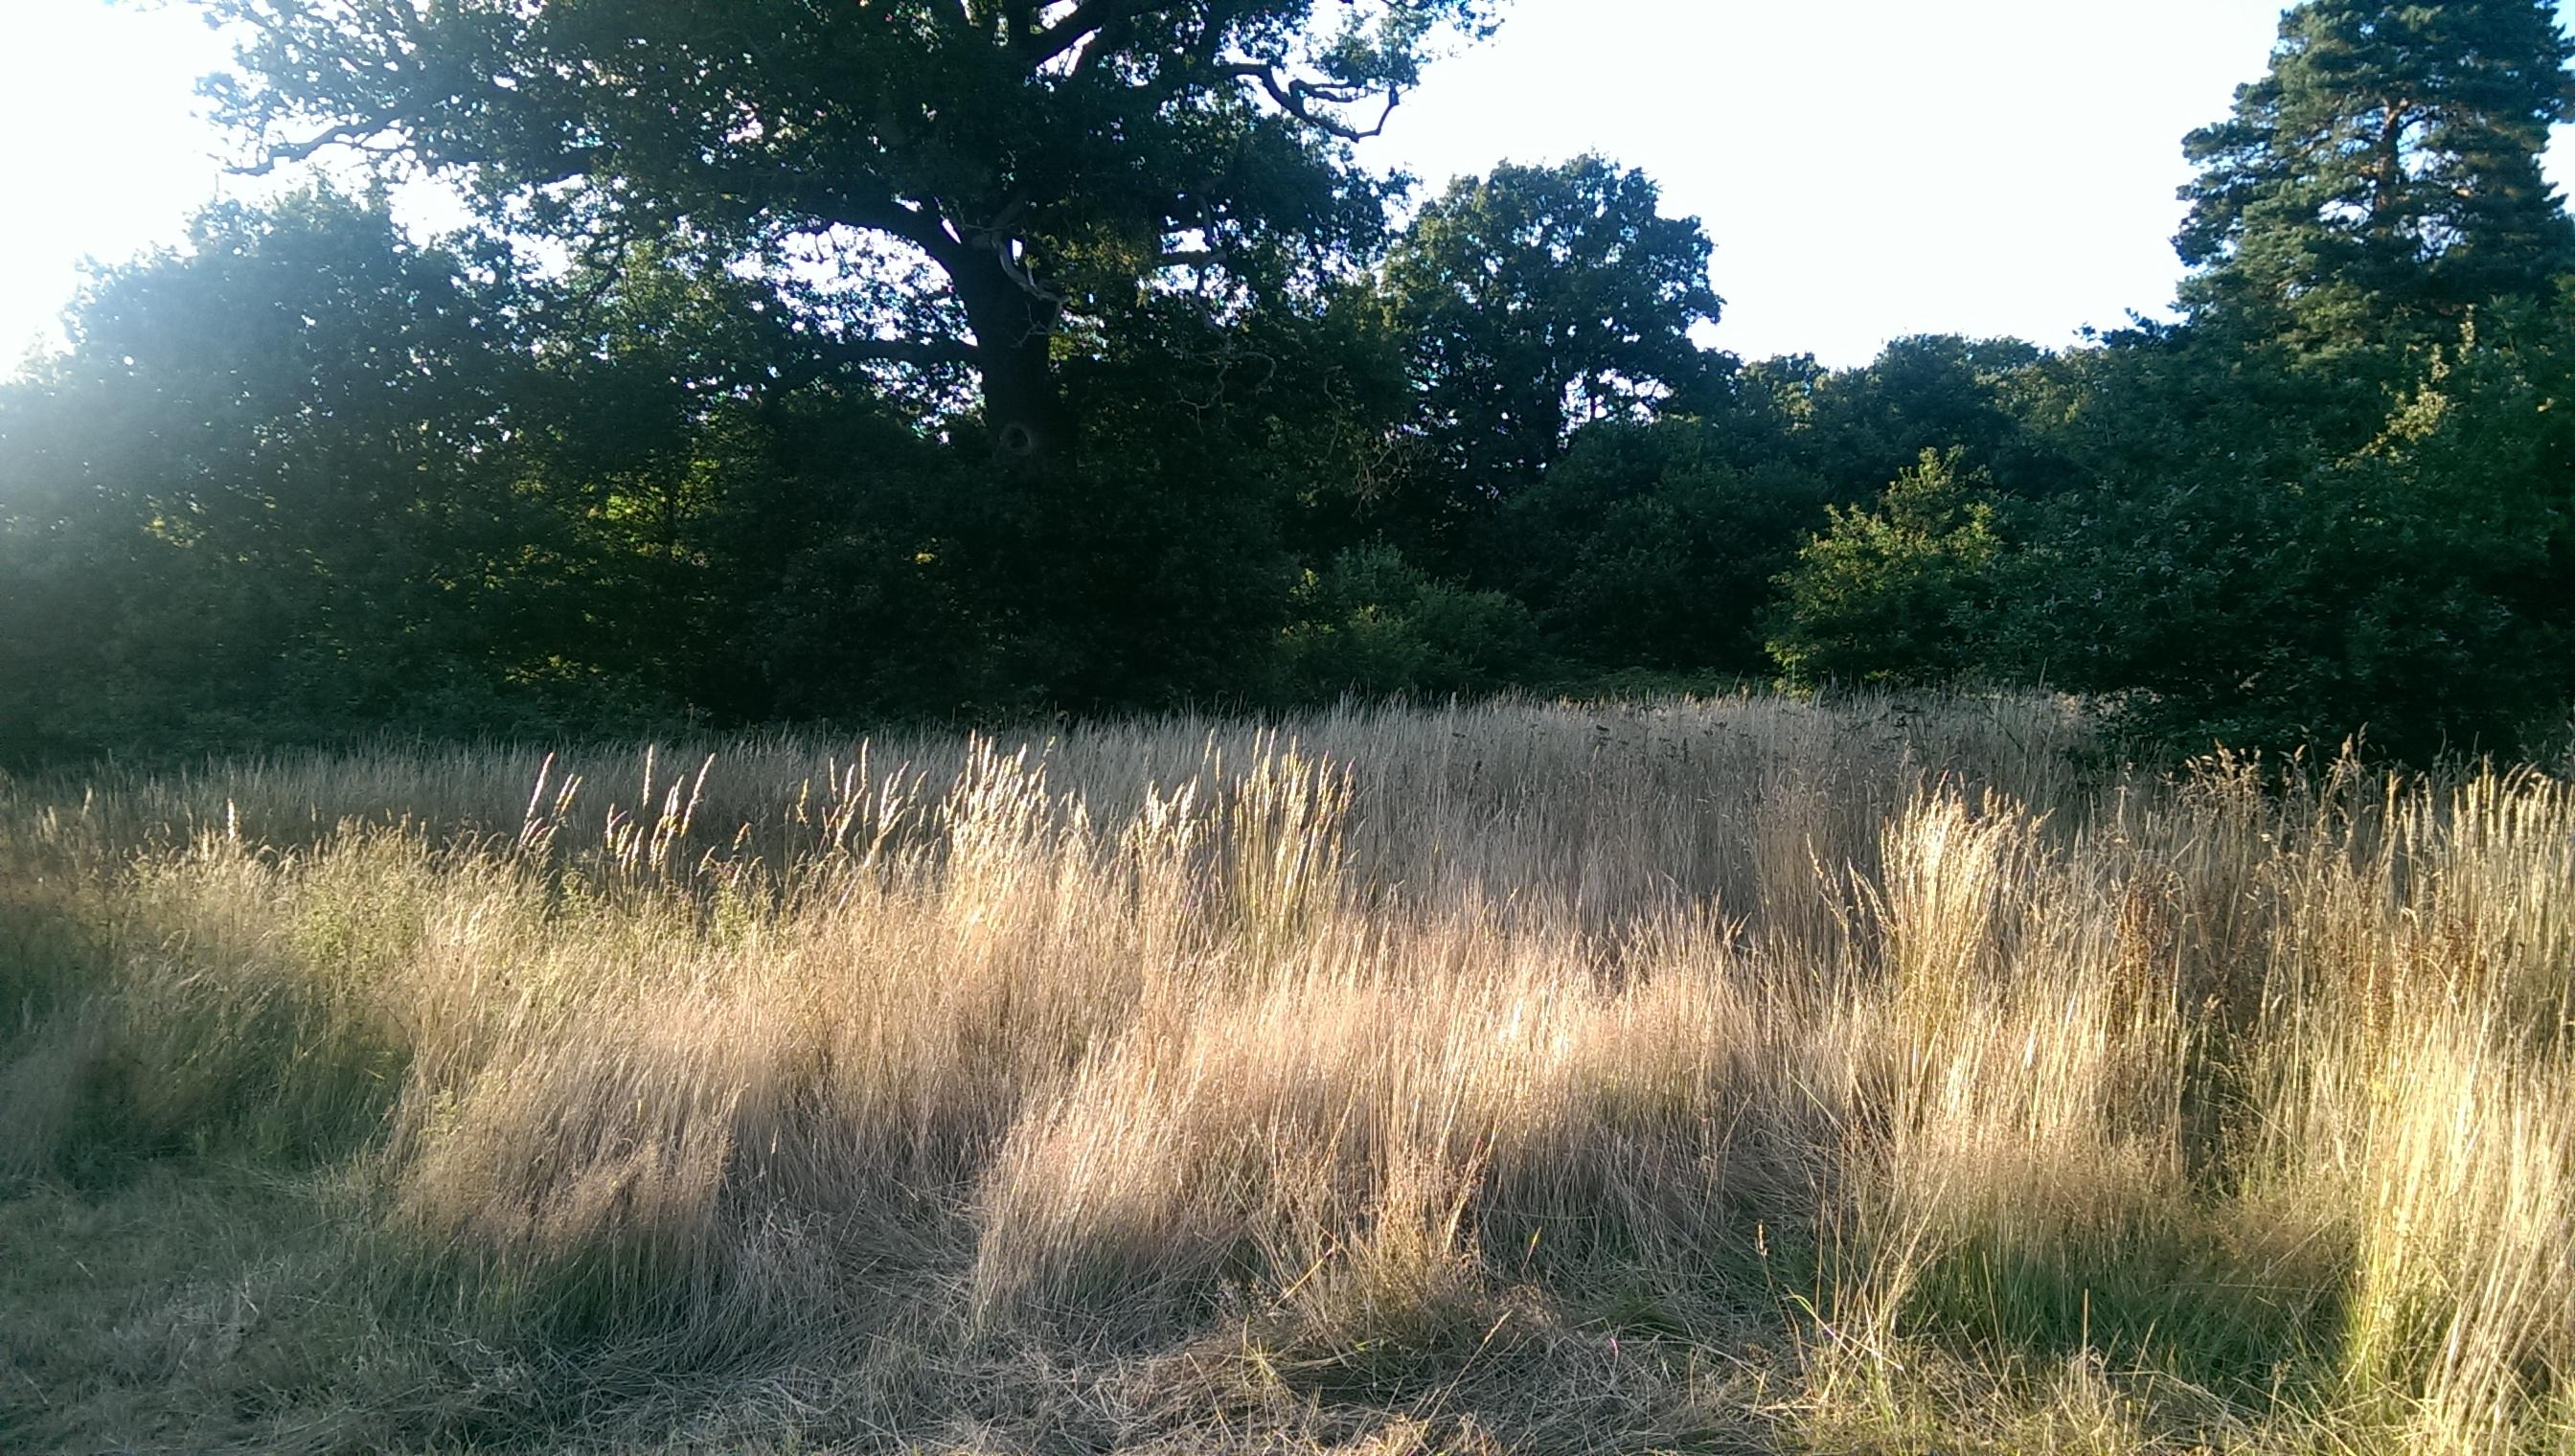 Grassland regime, Pope's Meadow, Bracknell